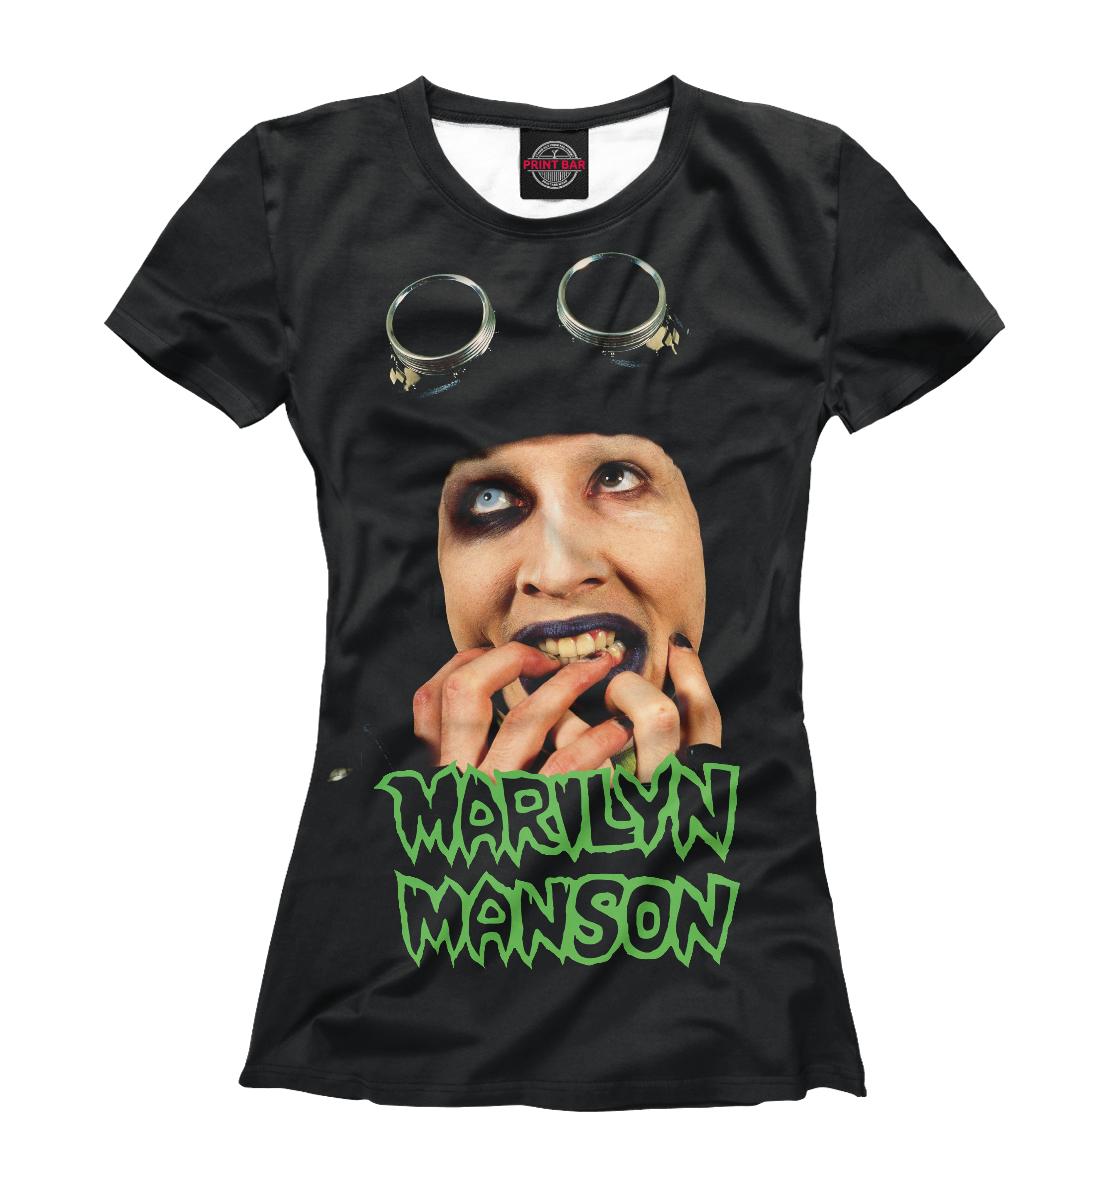 Купить Marilyn Manson, Printbar, Футболки, MRM-231556-fut-1